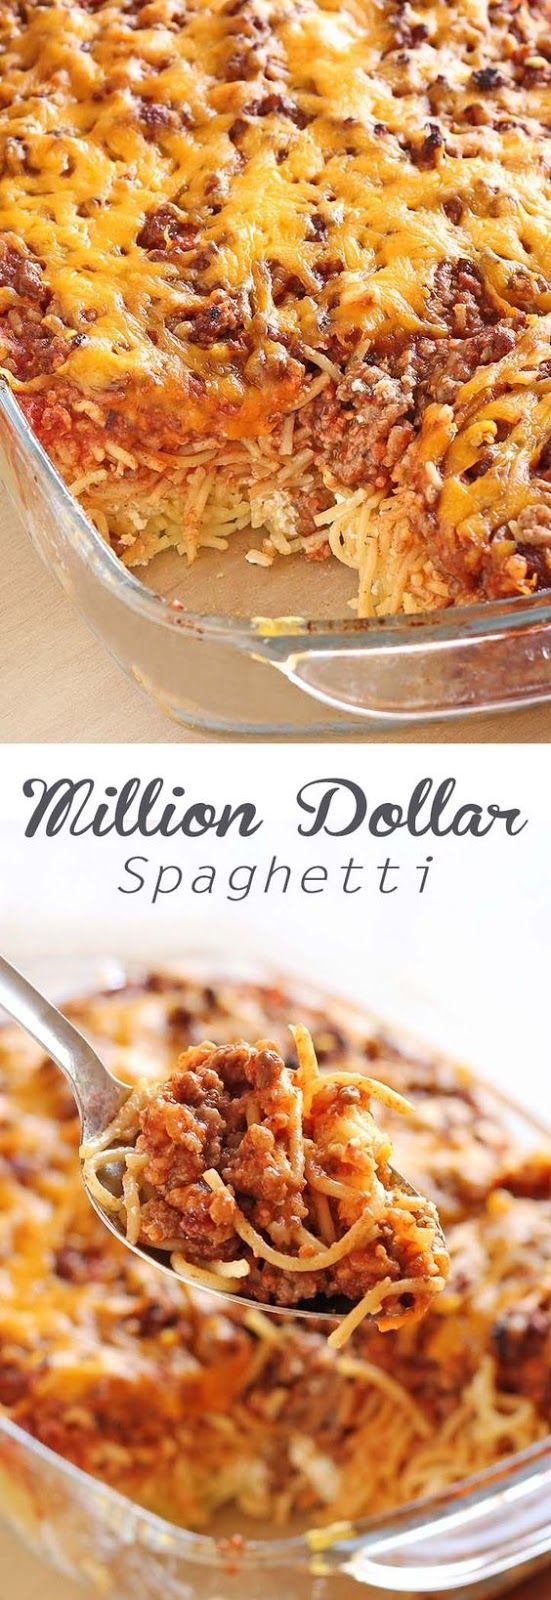 Easy Million Dollar Spaghetti [Video]